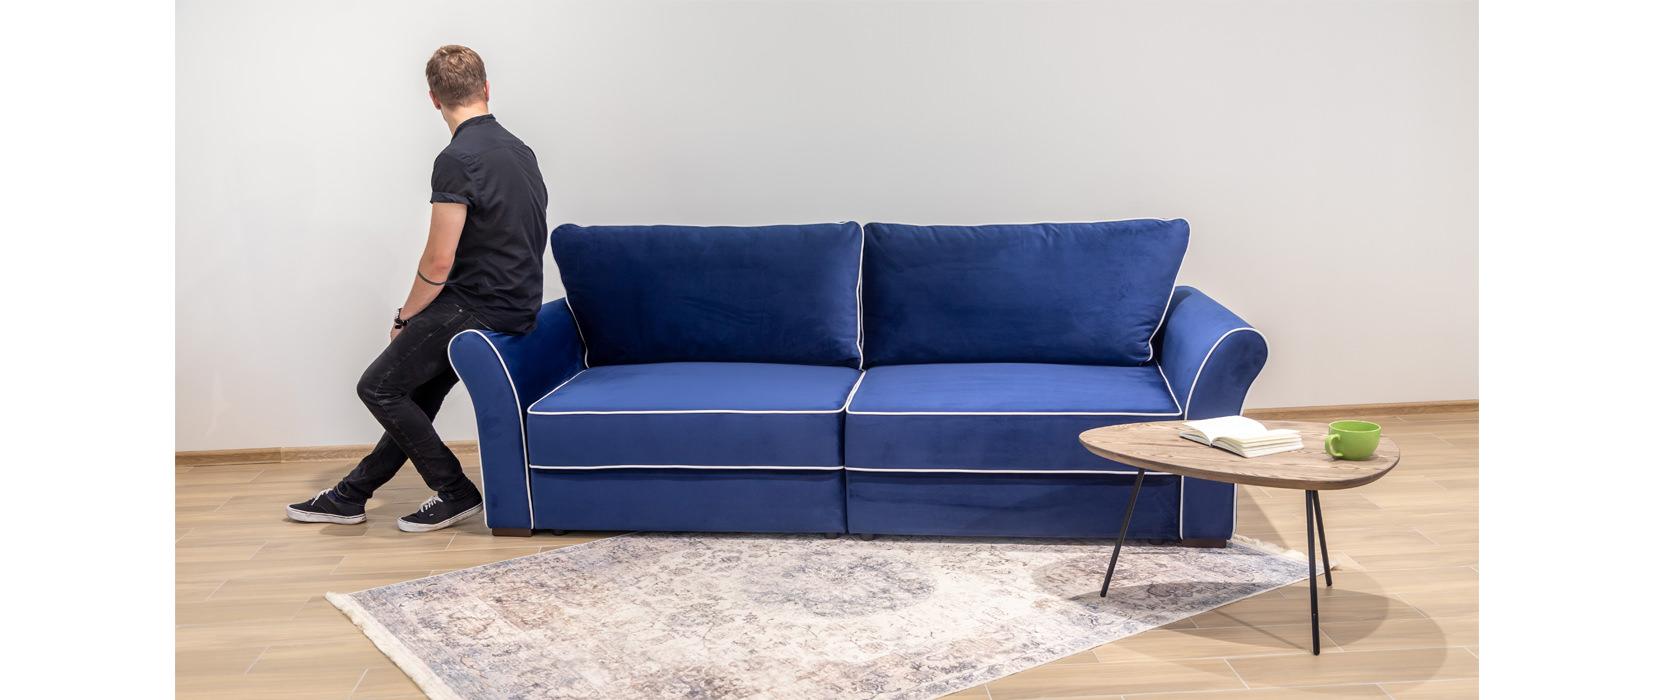 Трехместный диван Amadeo - Фото 1 - Pufetto